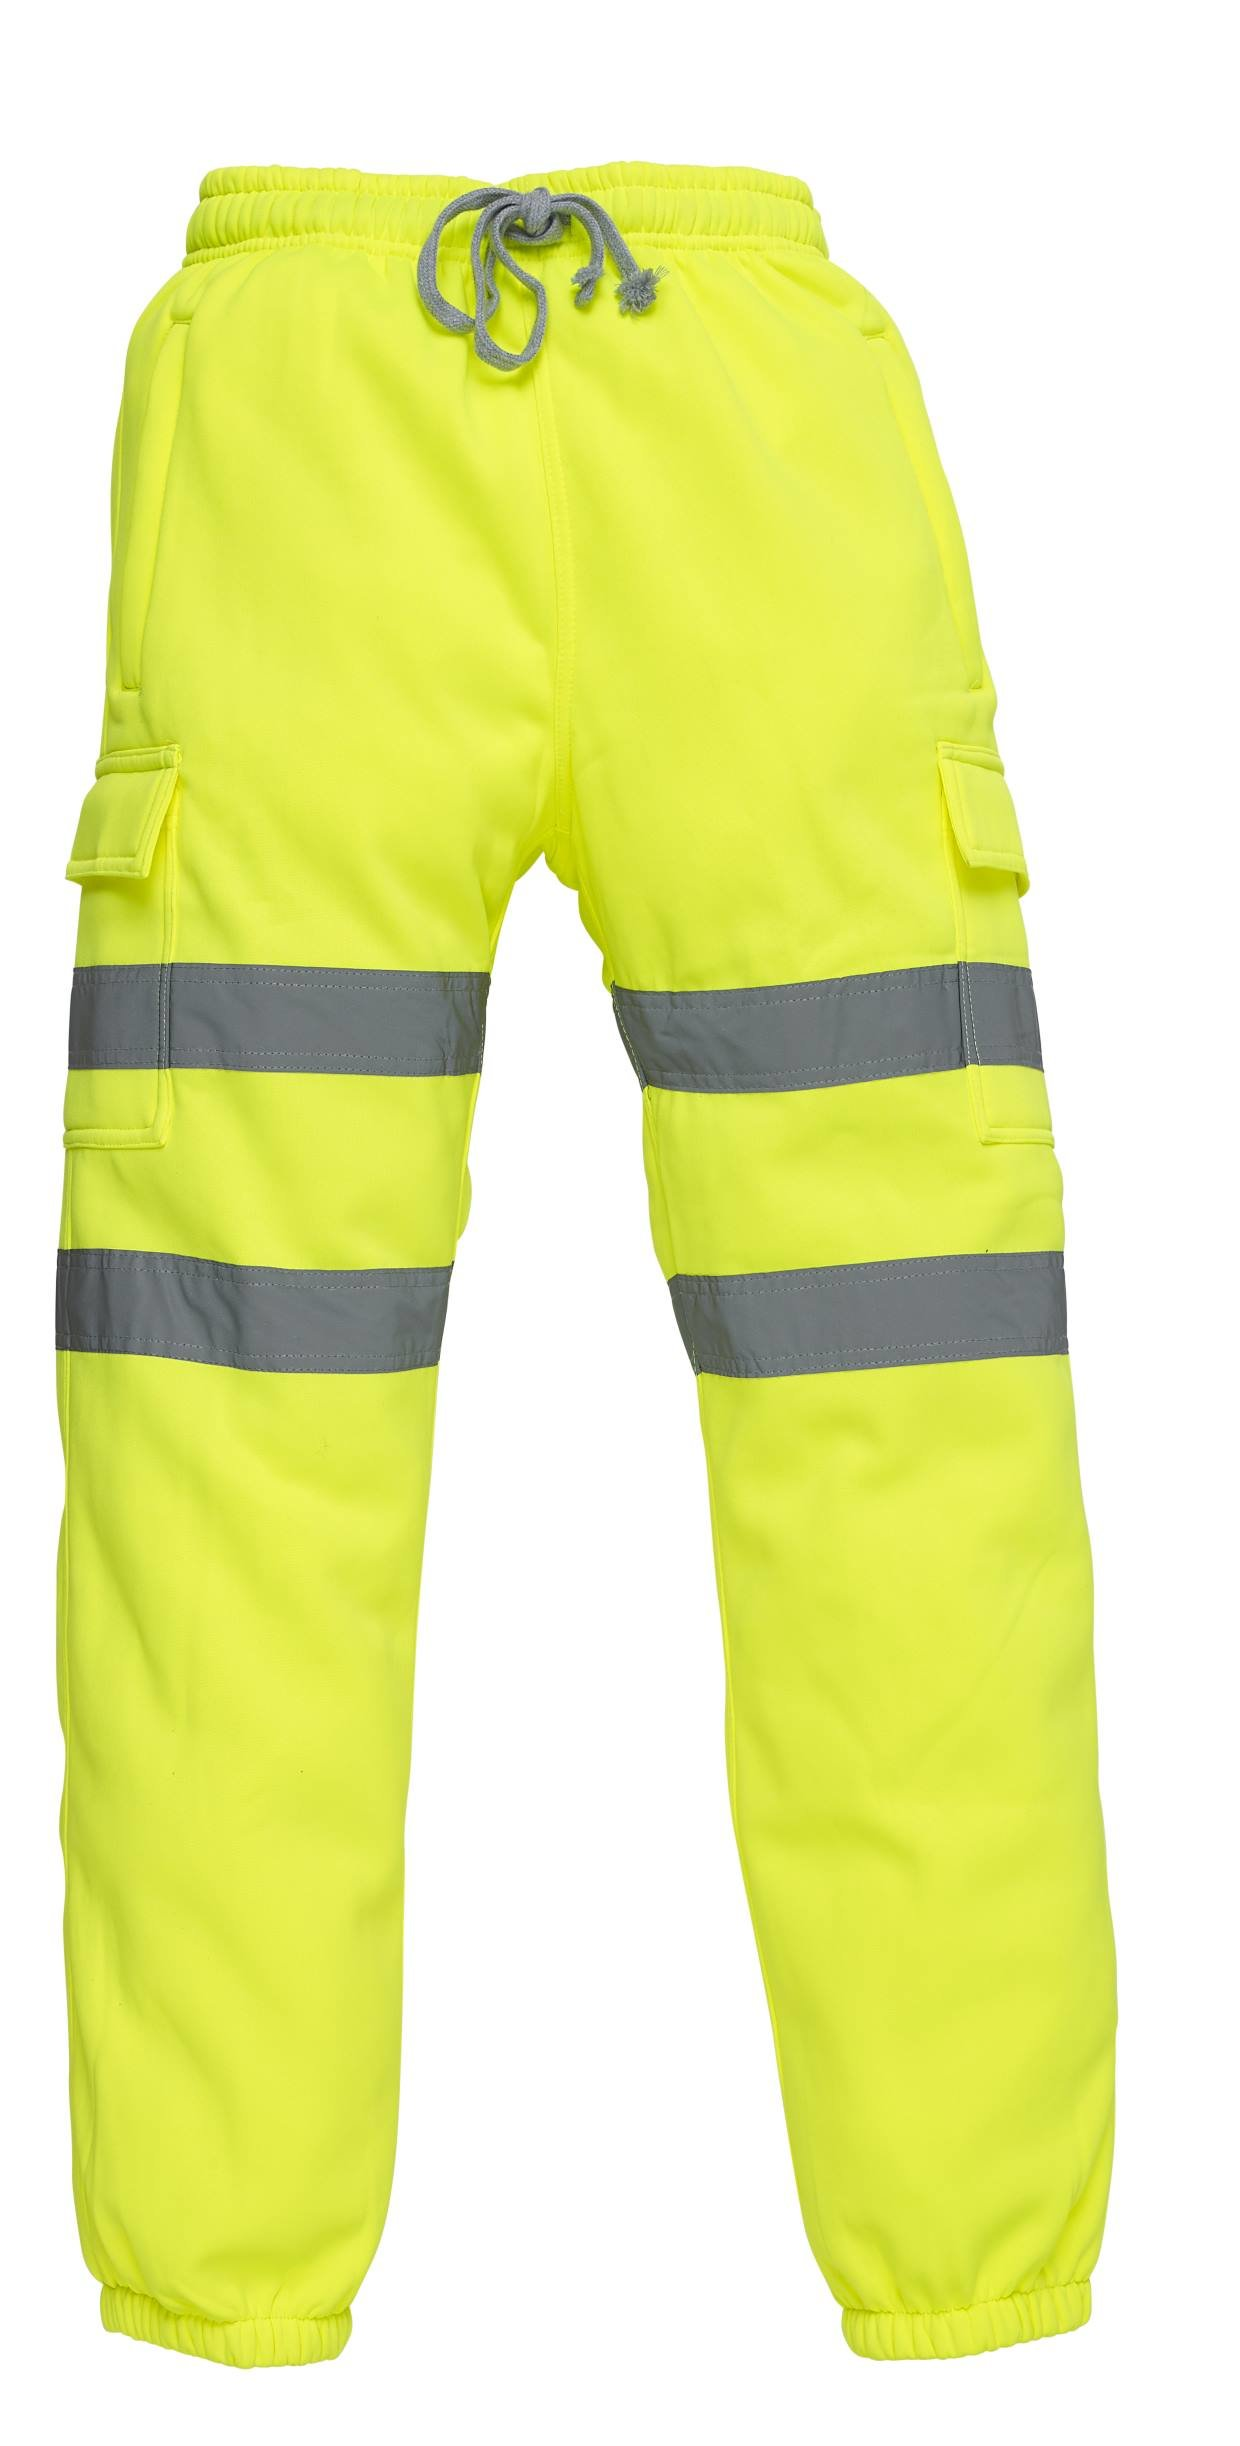 Personalised Hi Vis Jogging Work Pants (HV016T), www.ontimeprint.co.uk